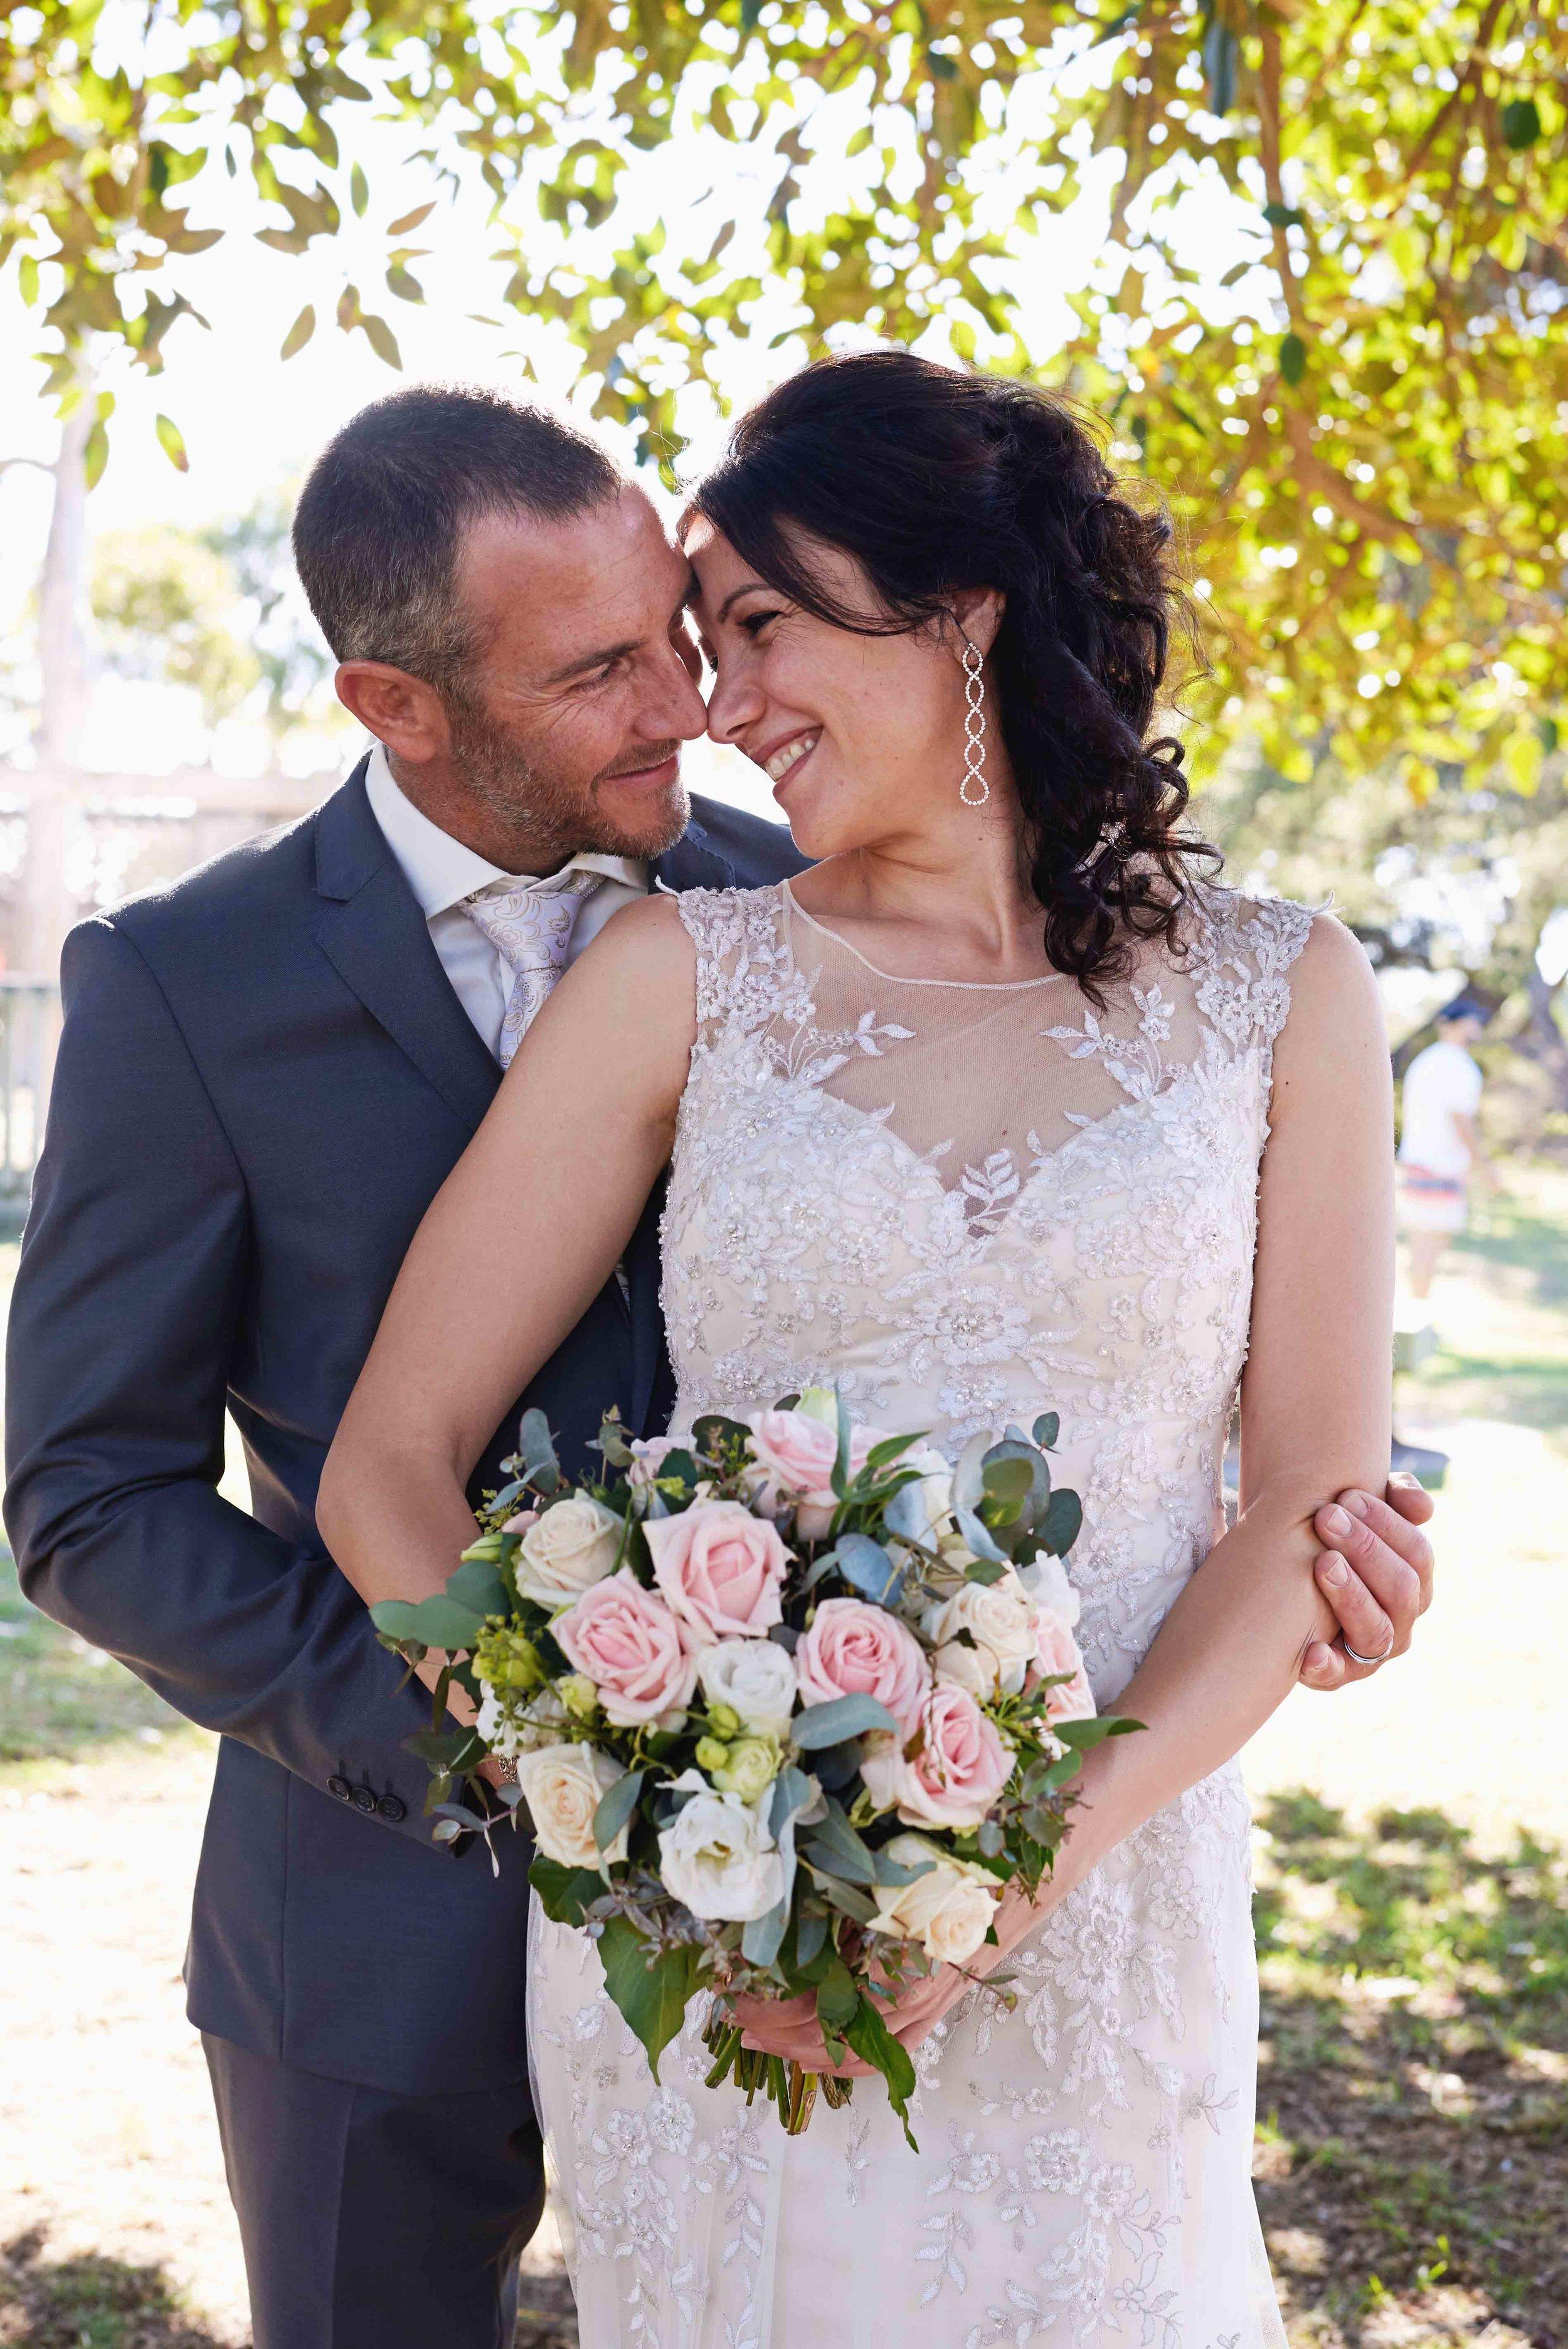 sorrento-wedding-photography-all-smiles-marissa-jade-photography-155.jpg